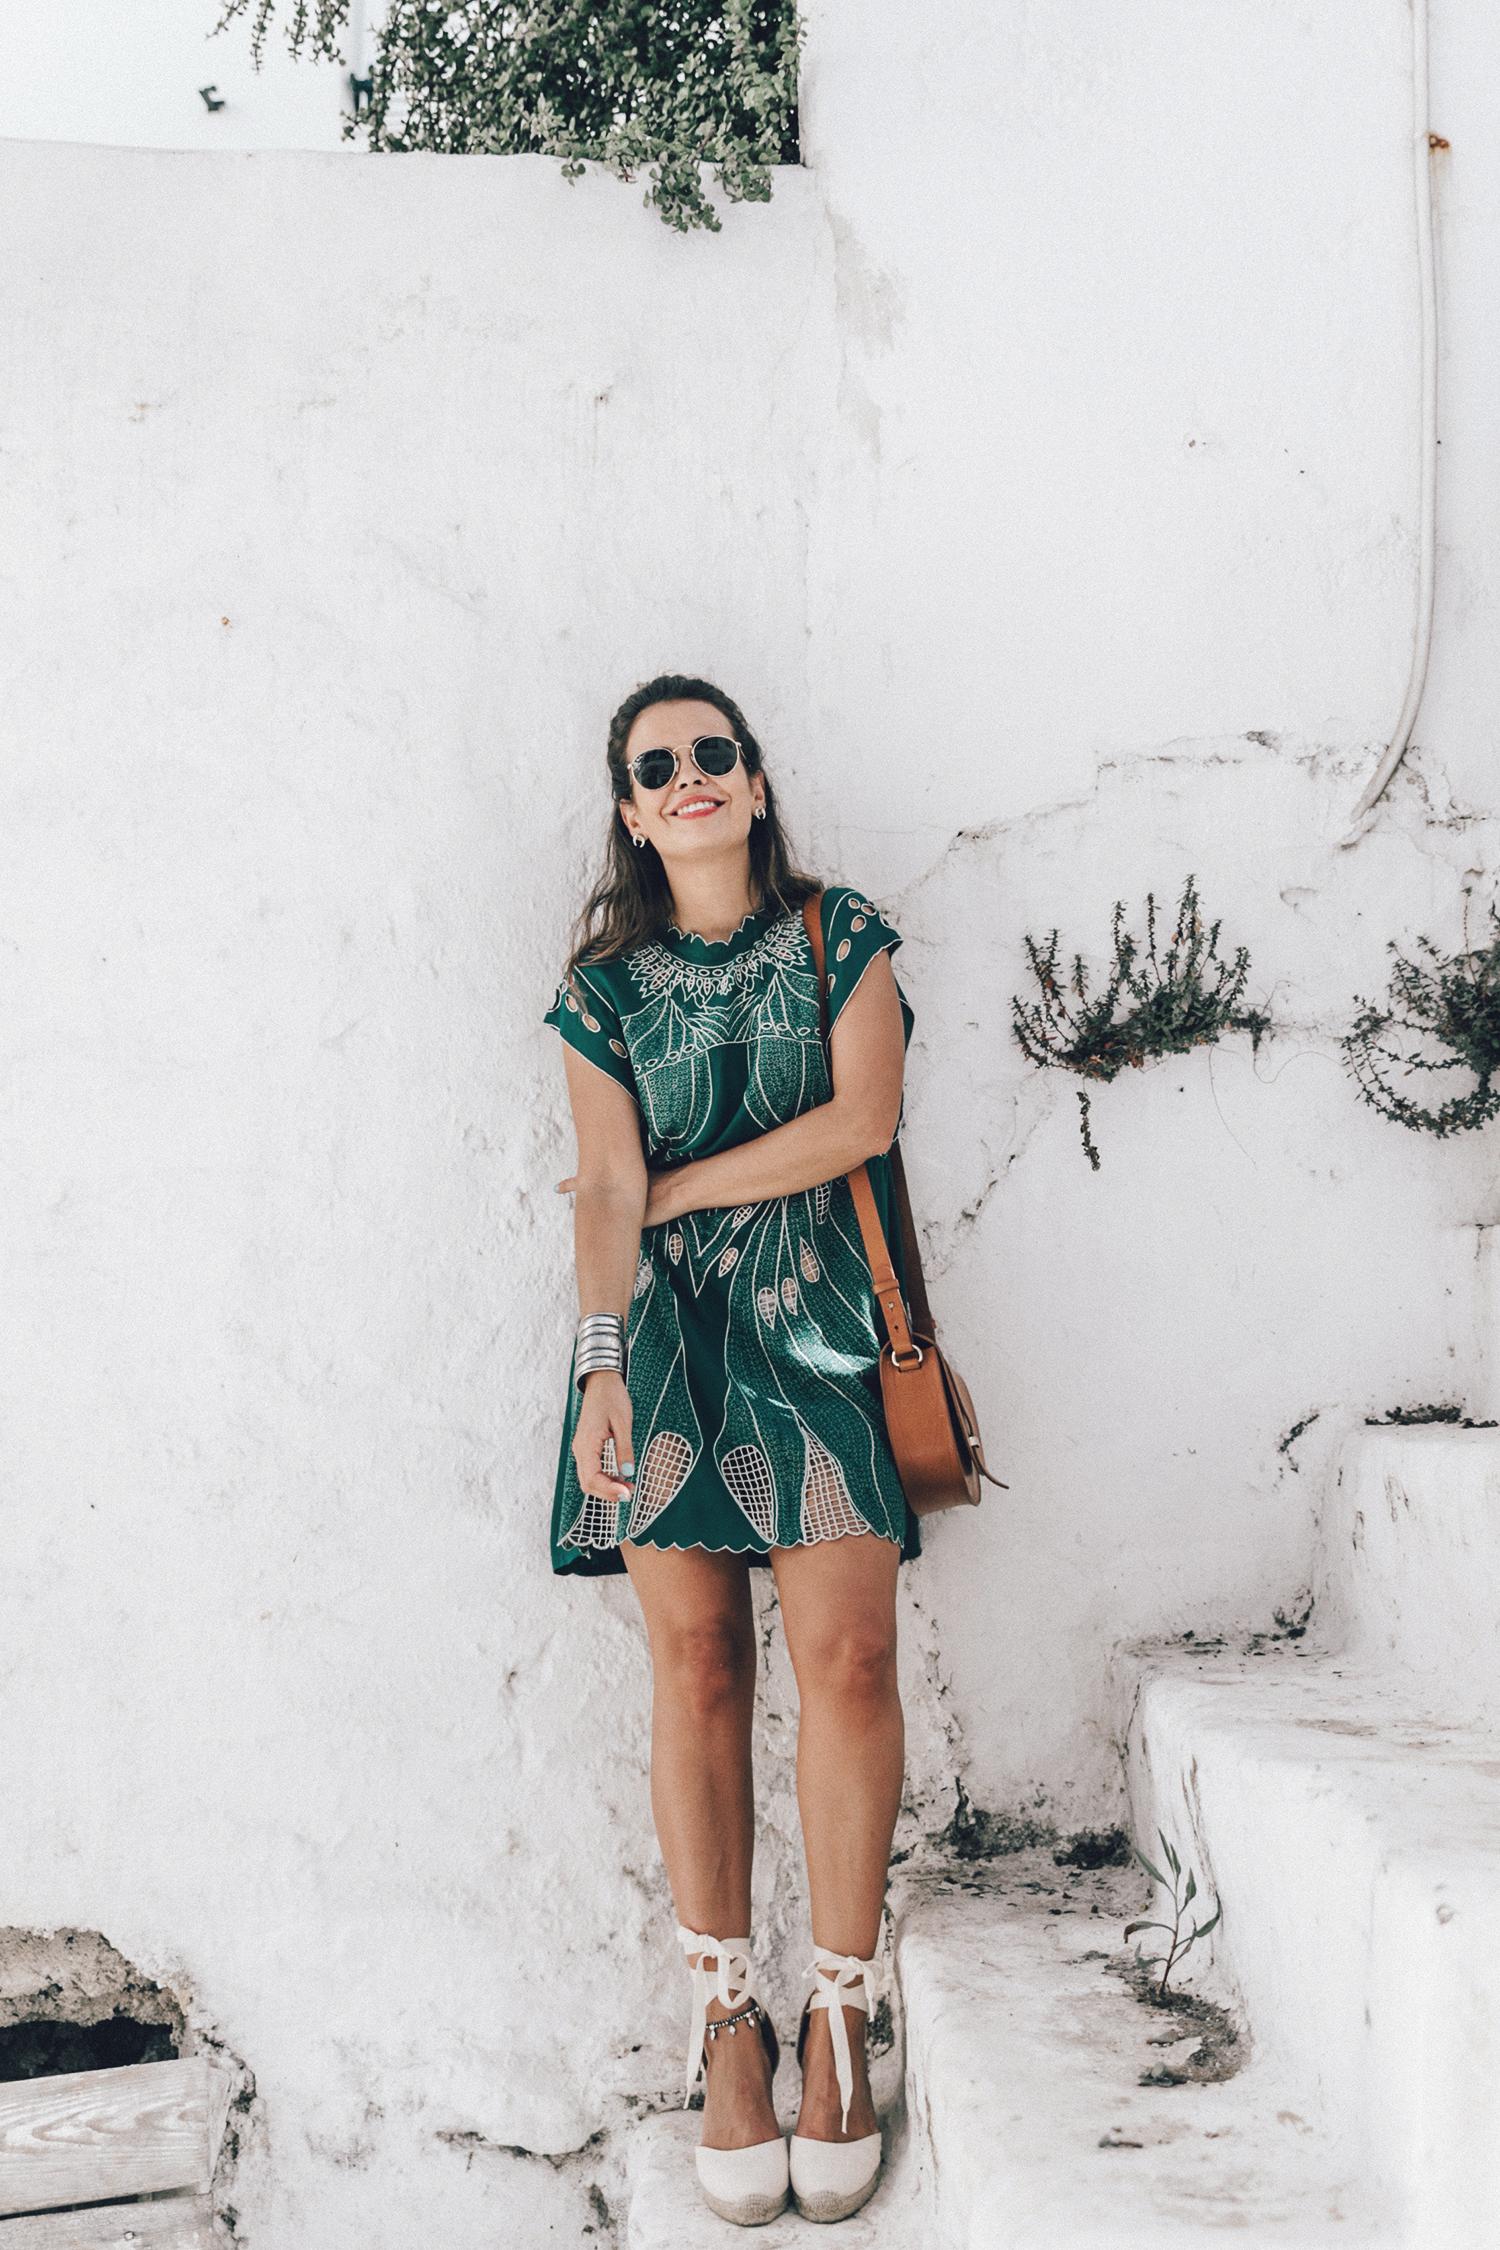 Tularosa_Dress-Soludos_Escapes-Soludos_Espadrilles-Sezane_Bag-Leather_Crossbody_Bag-Boho_Outfit-Look-Ray_Ban-Street_Style-Mykonos-Greece-Collage_Vintage-18-Recuperado